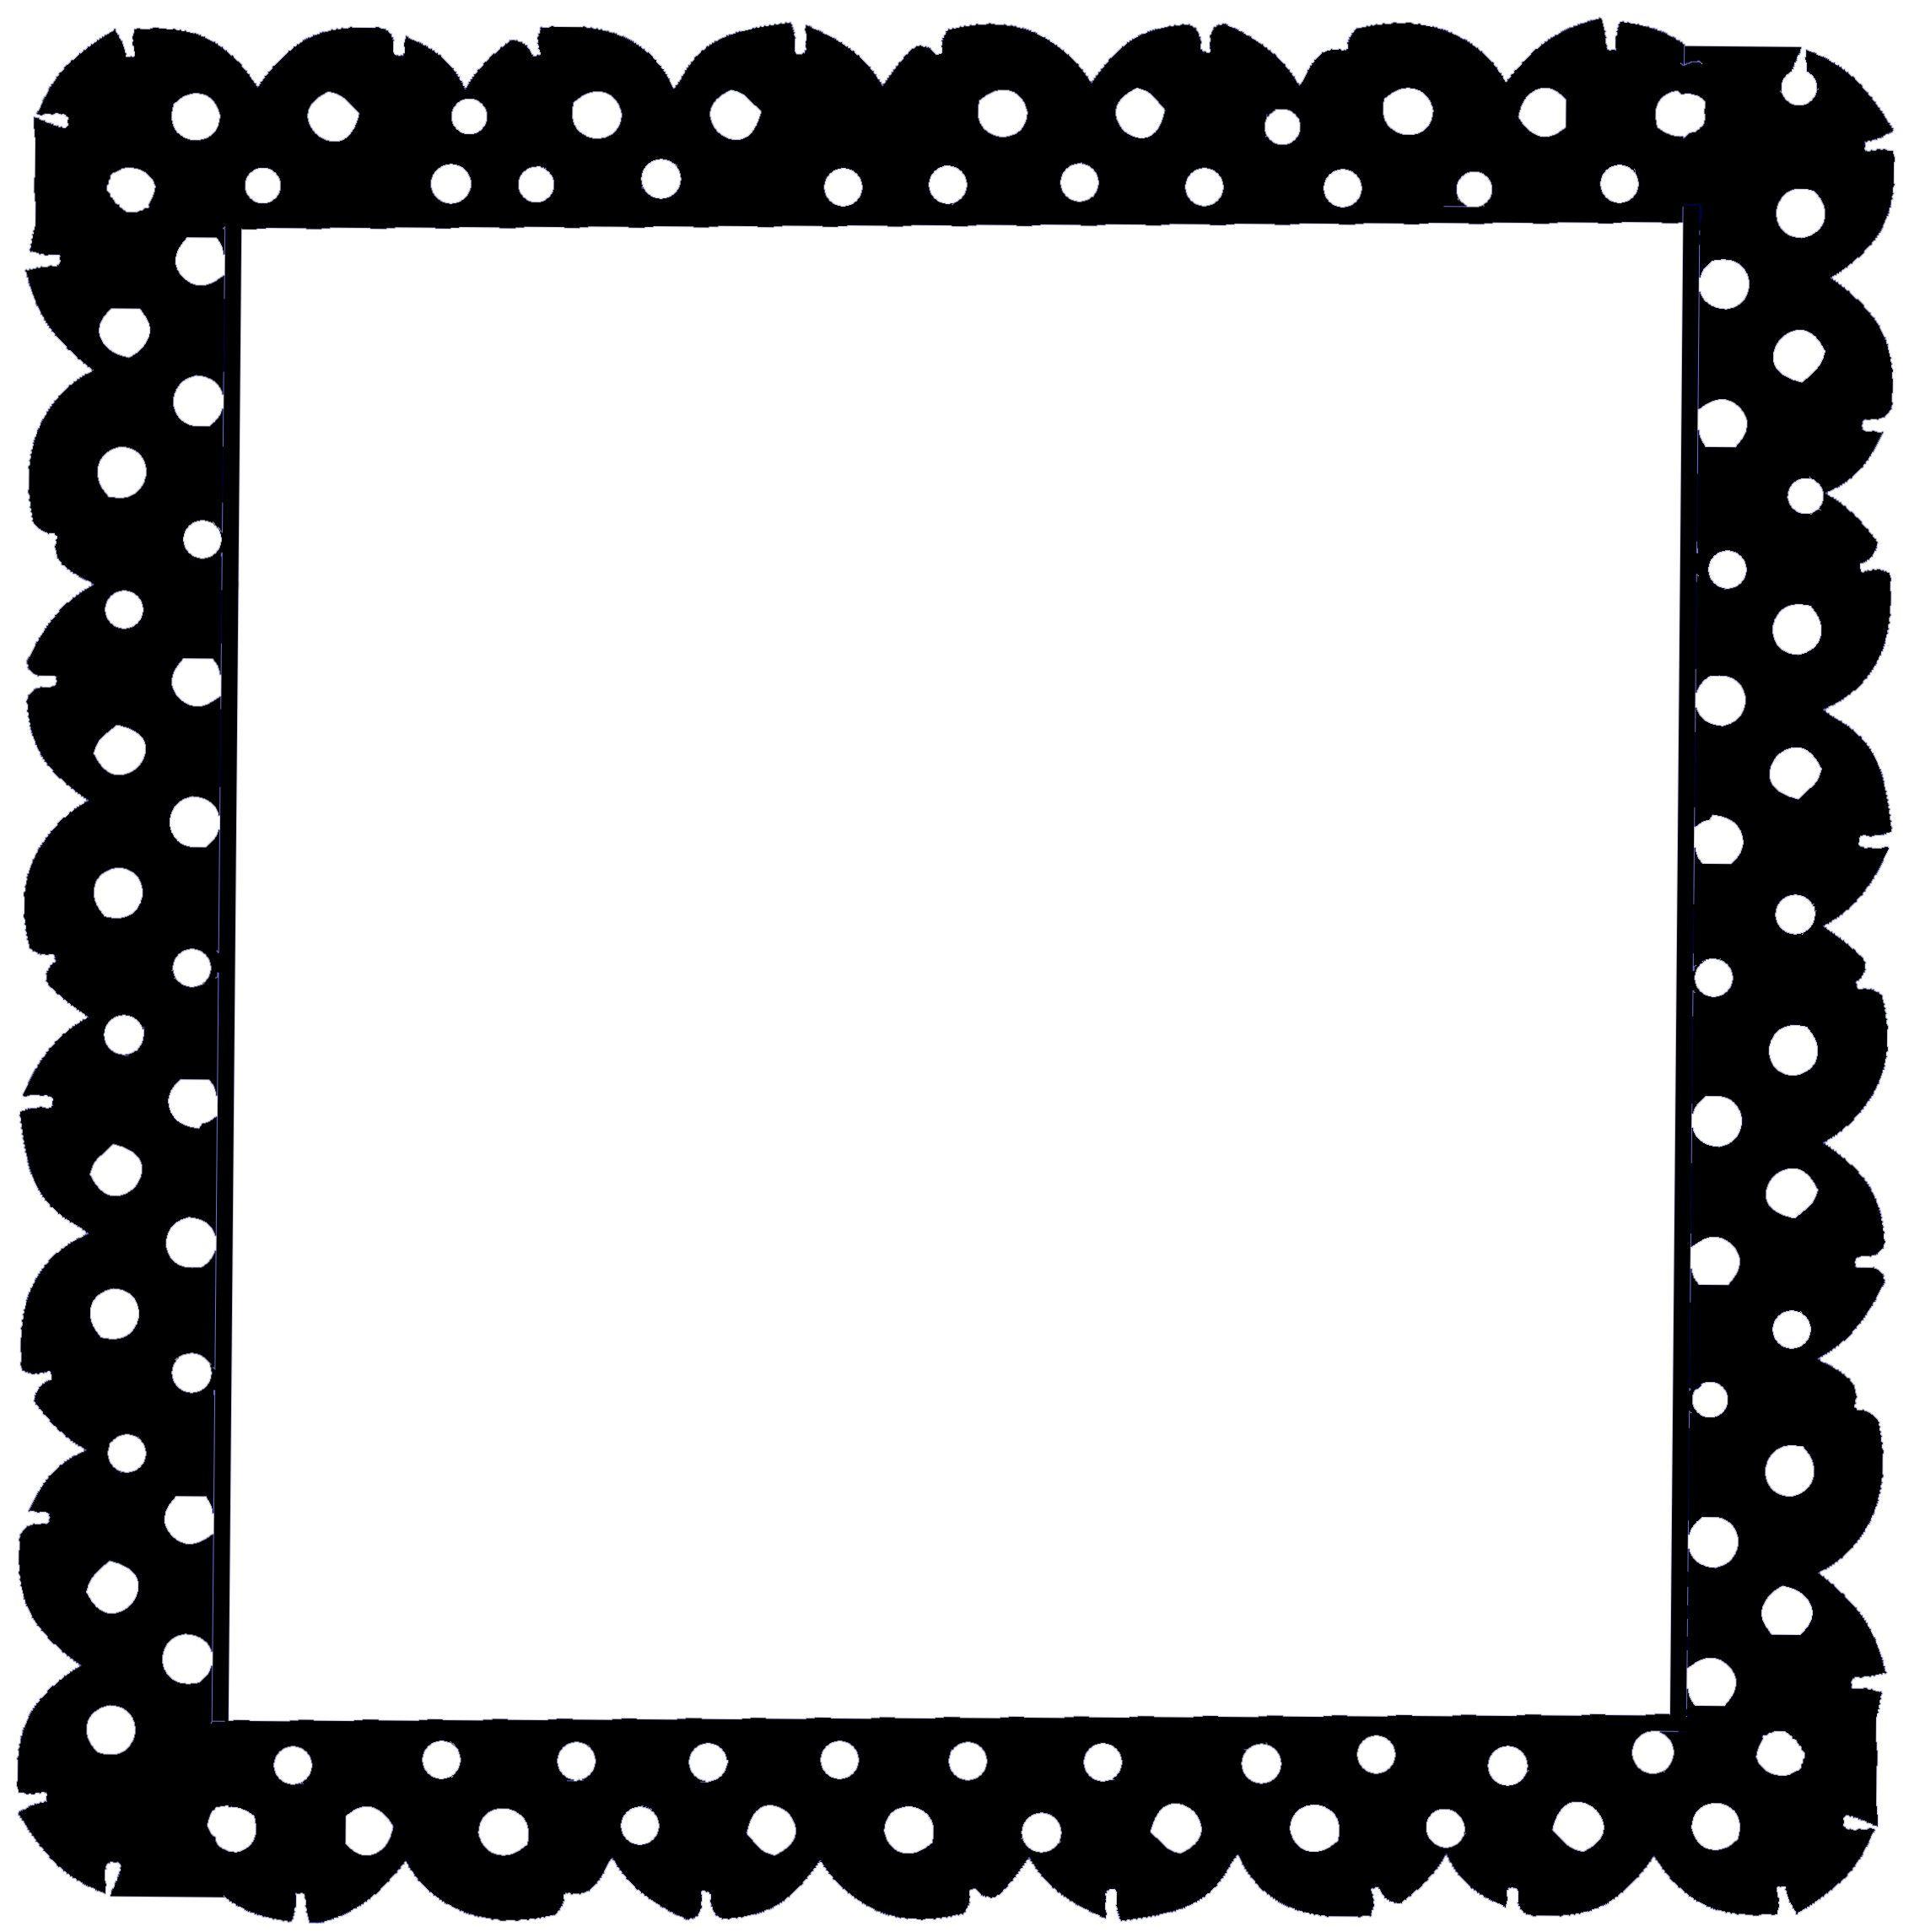 polka dot scallop free SVG! Silhouette Freebies